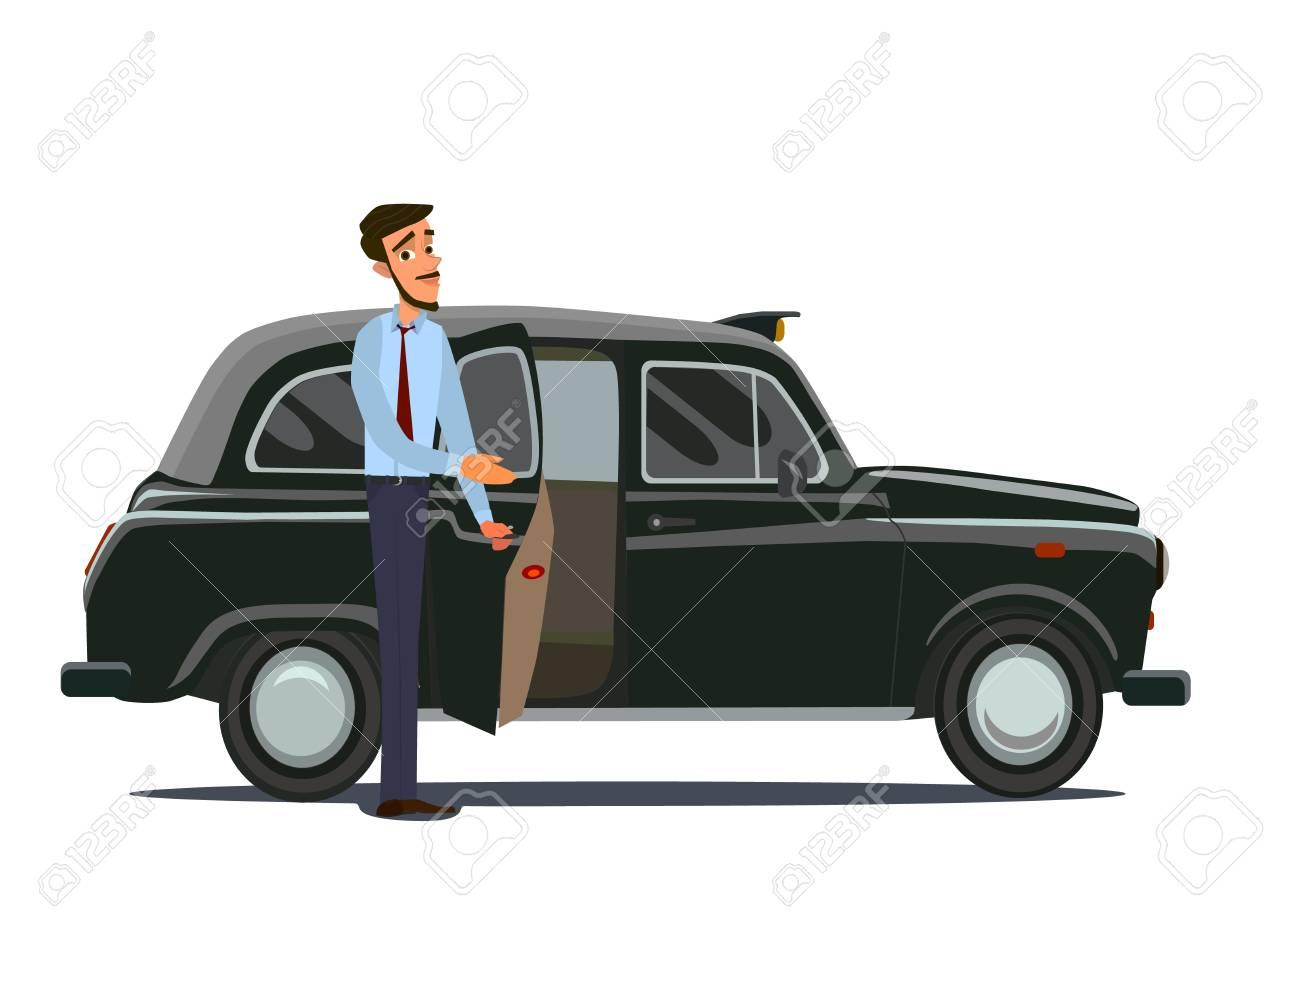 Taxi driver concept  Car, transport, transportation, transfer